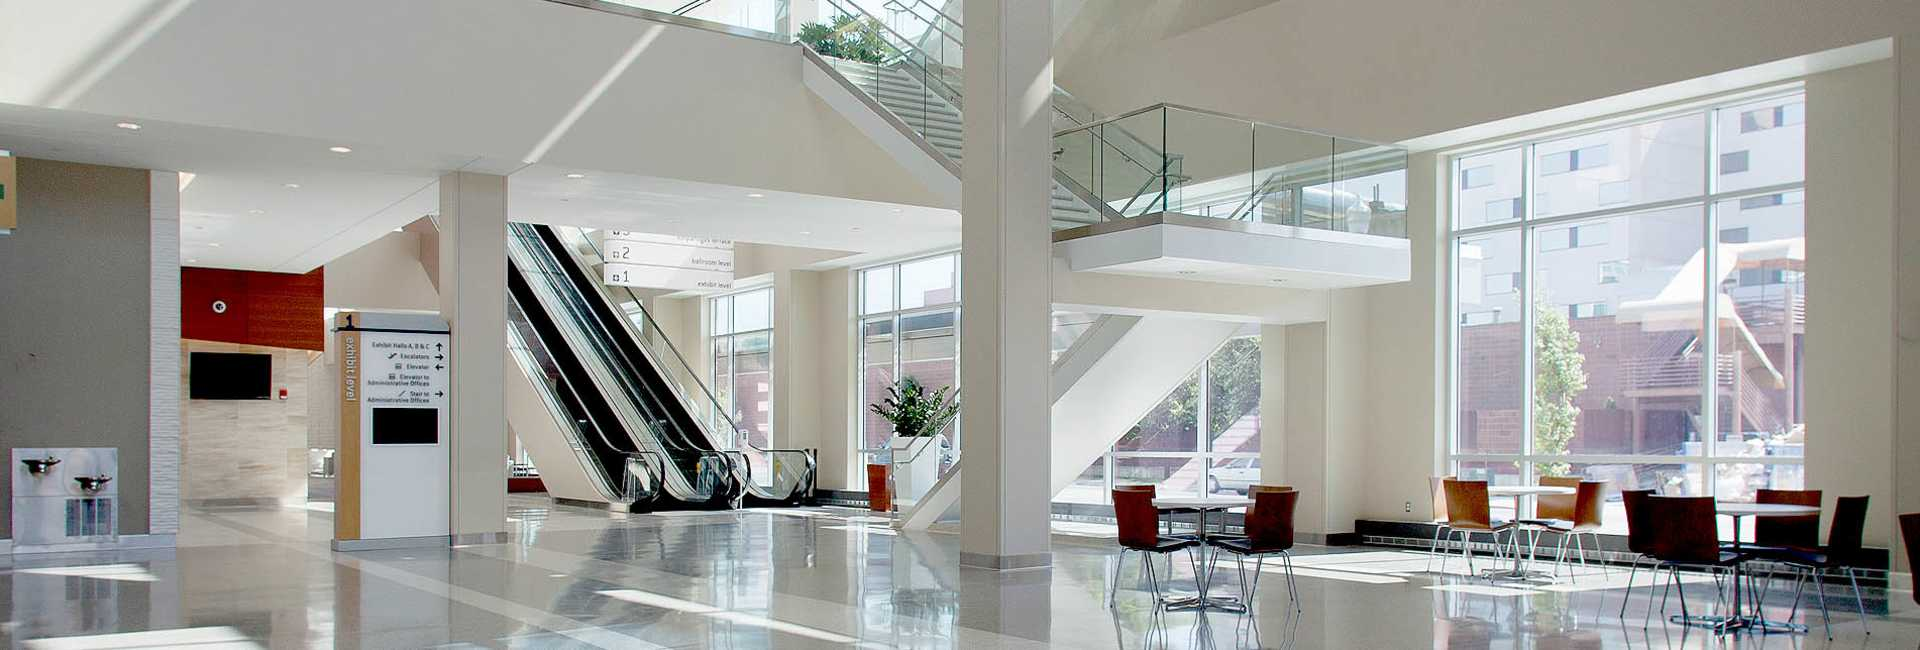 Utah Valley Convention Center lobby